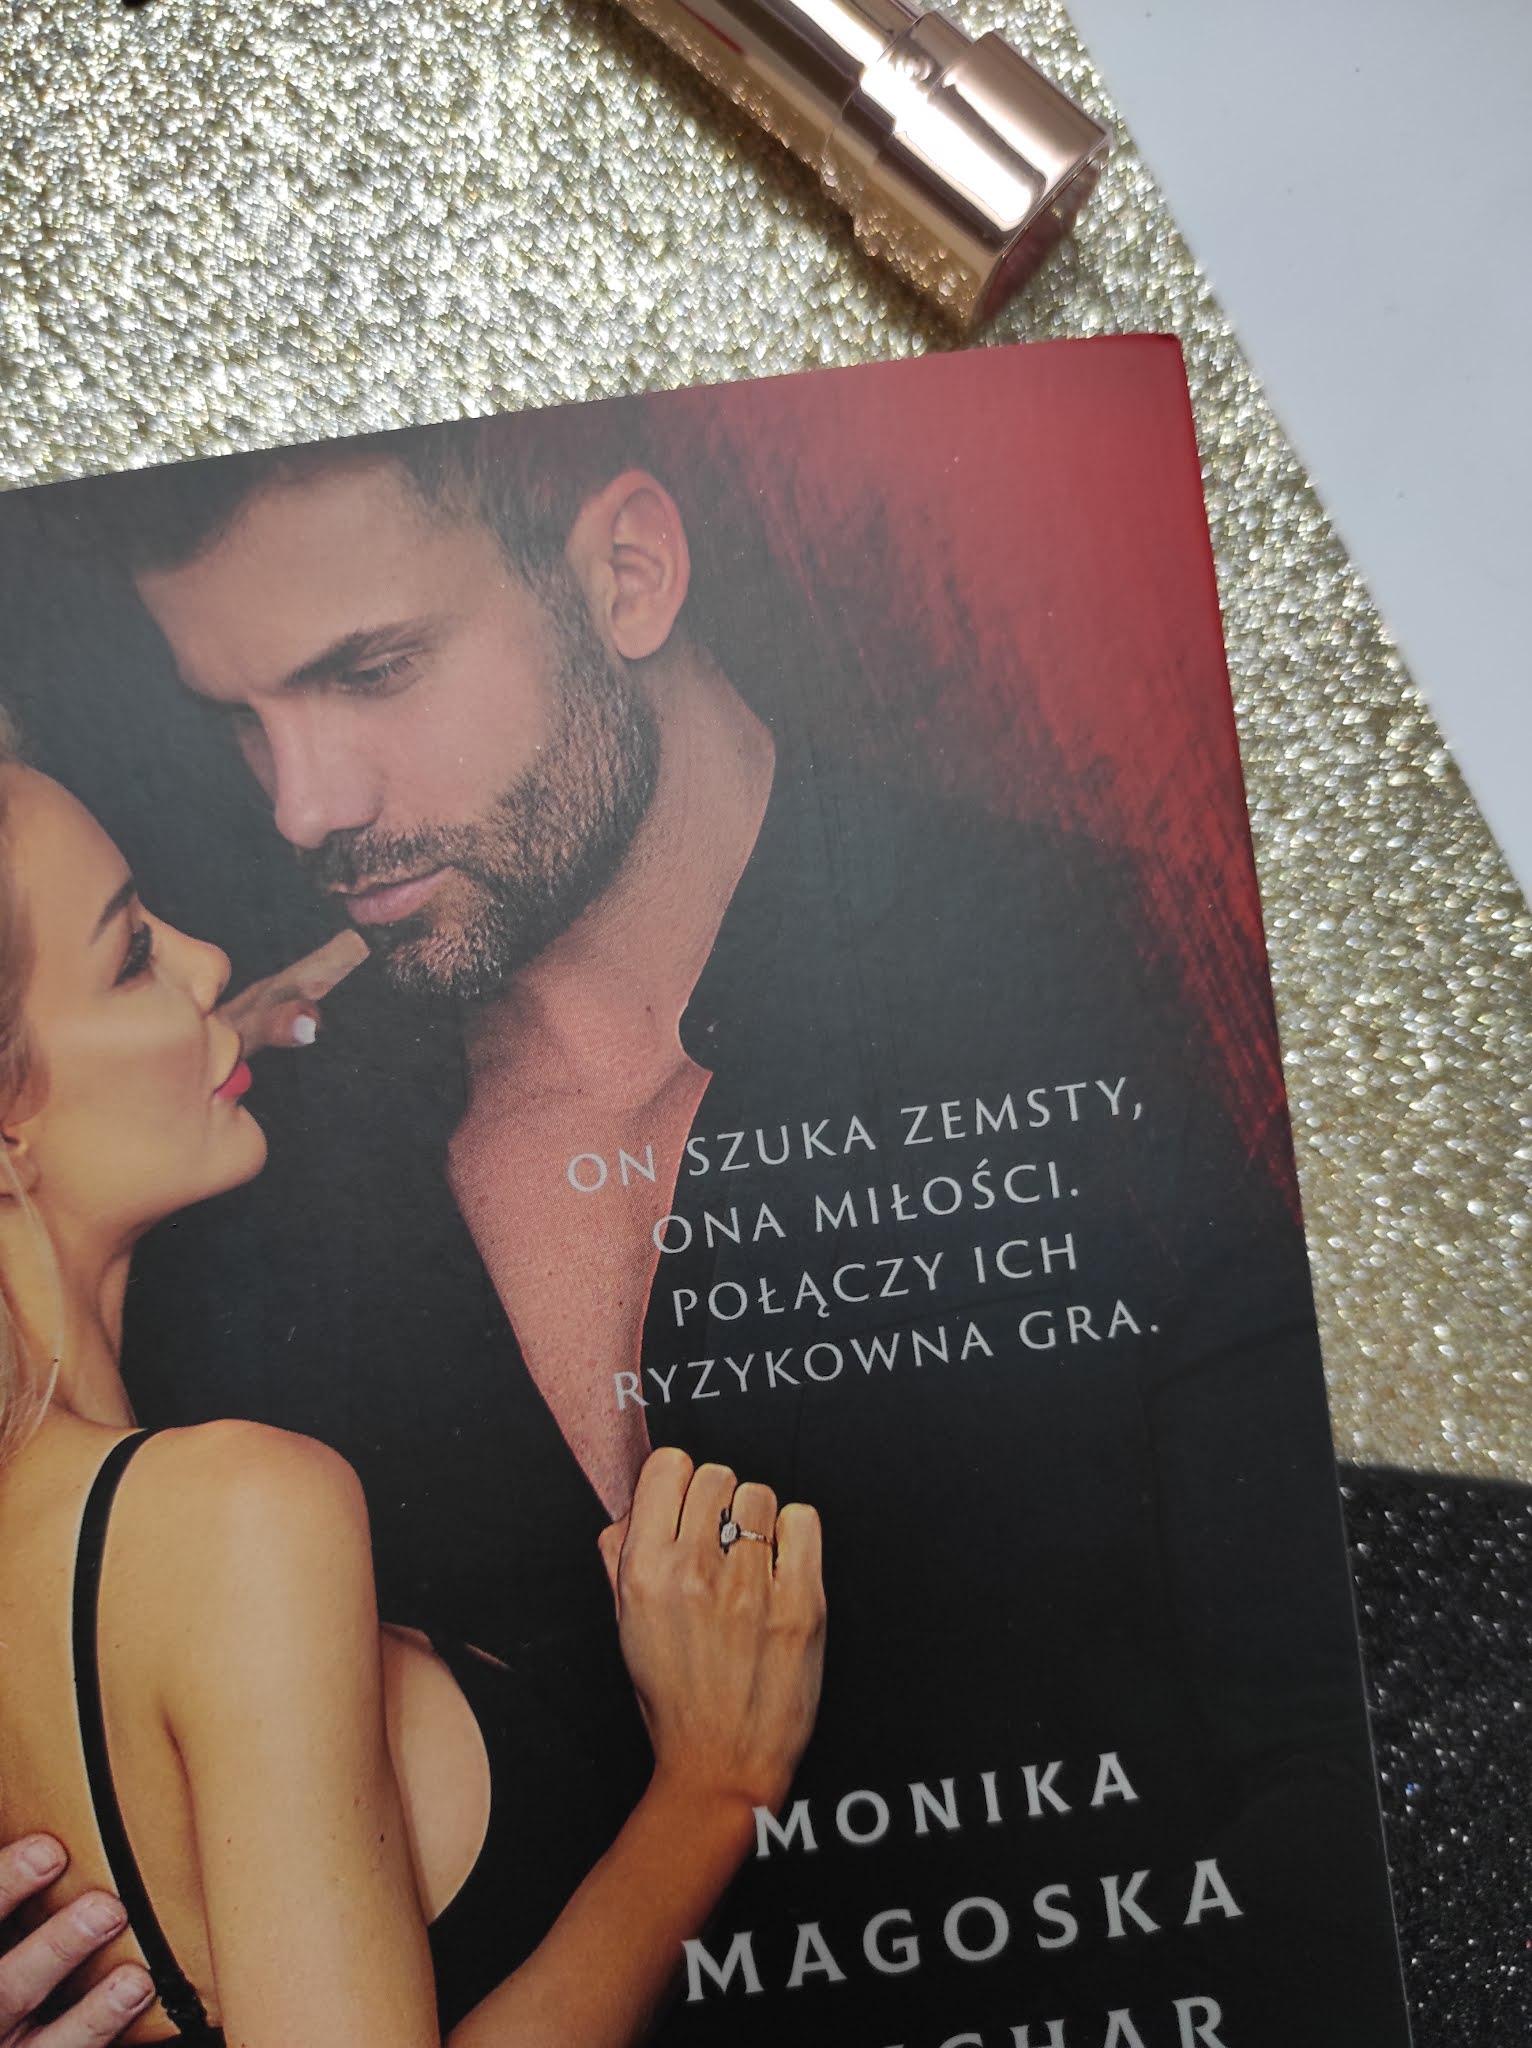 """Szantaż"" Monika Magoska Suchar - recenzja - Patronat Medialny"